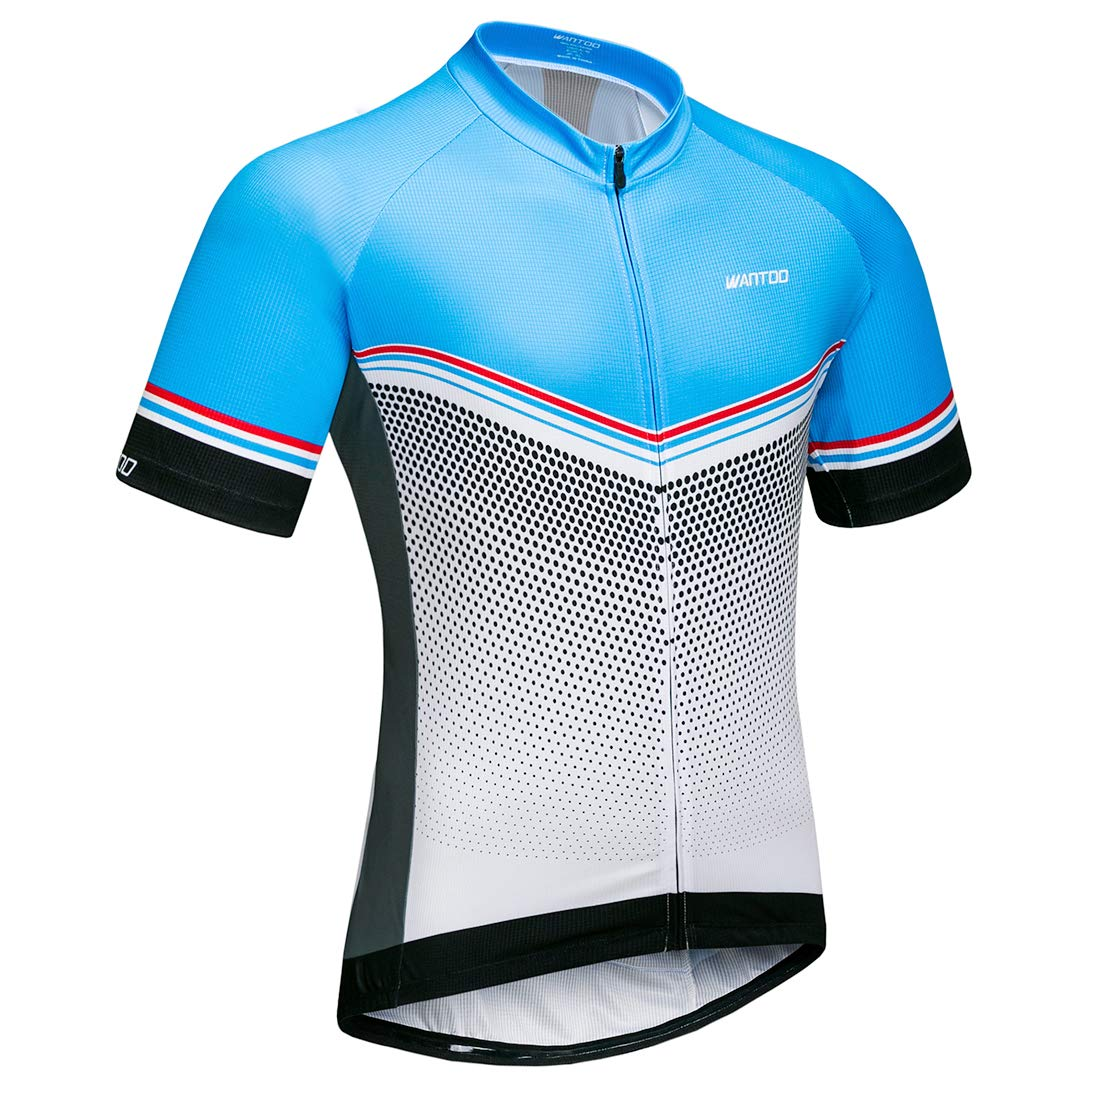 Wantdo メンズ サイクリング ジャージ 半袖 通気性 速乾 バイクシャツ 高伸縮性 しわ防止 通気性 反射 ロードマウンテン バイキング トップス Large ブルーホワイト B07DCSMR2J